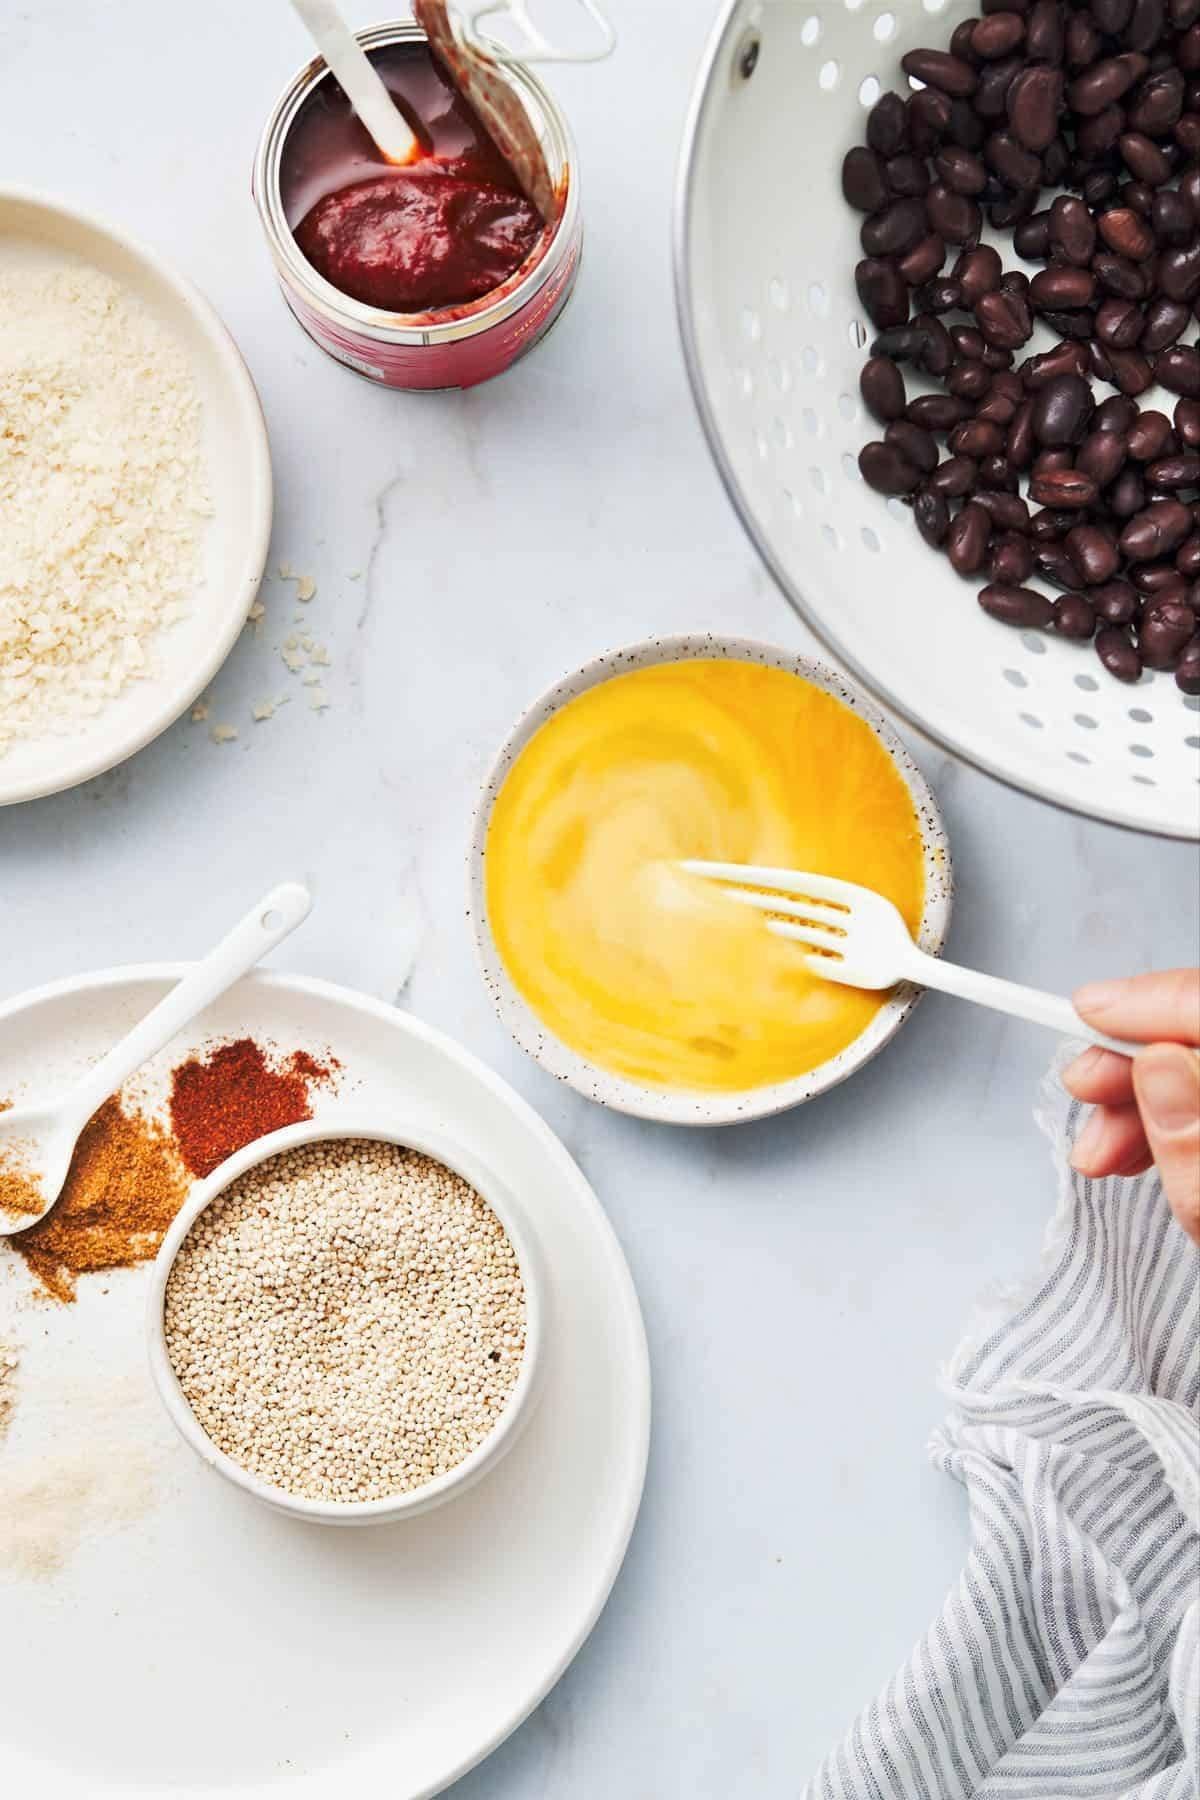 Ingredients for quinoa burgers.